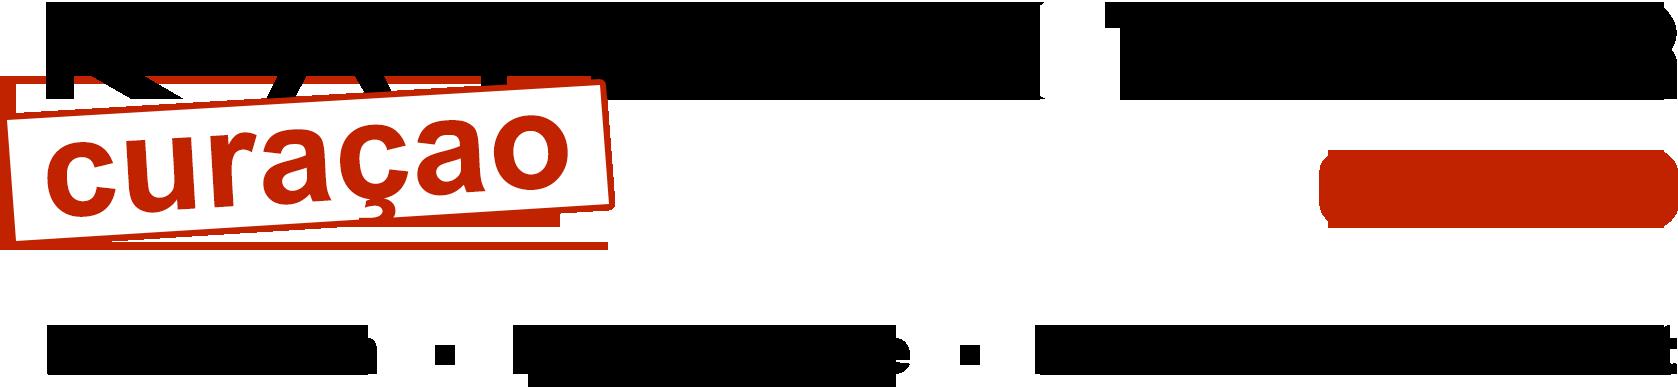 Karakter Curaçao